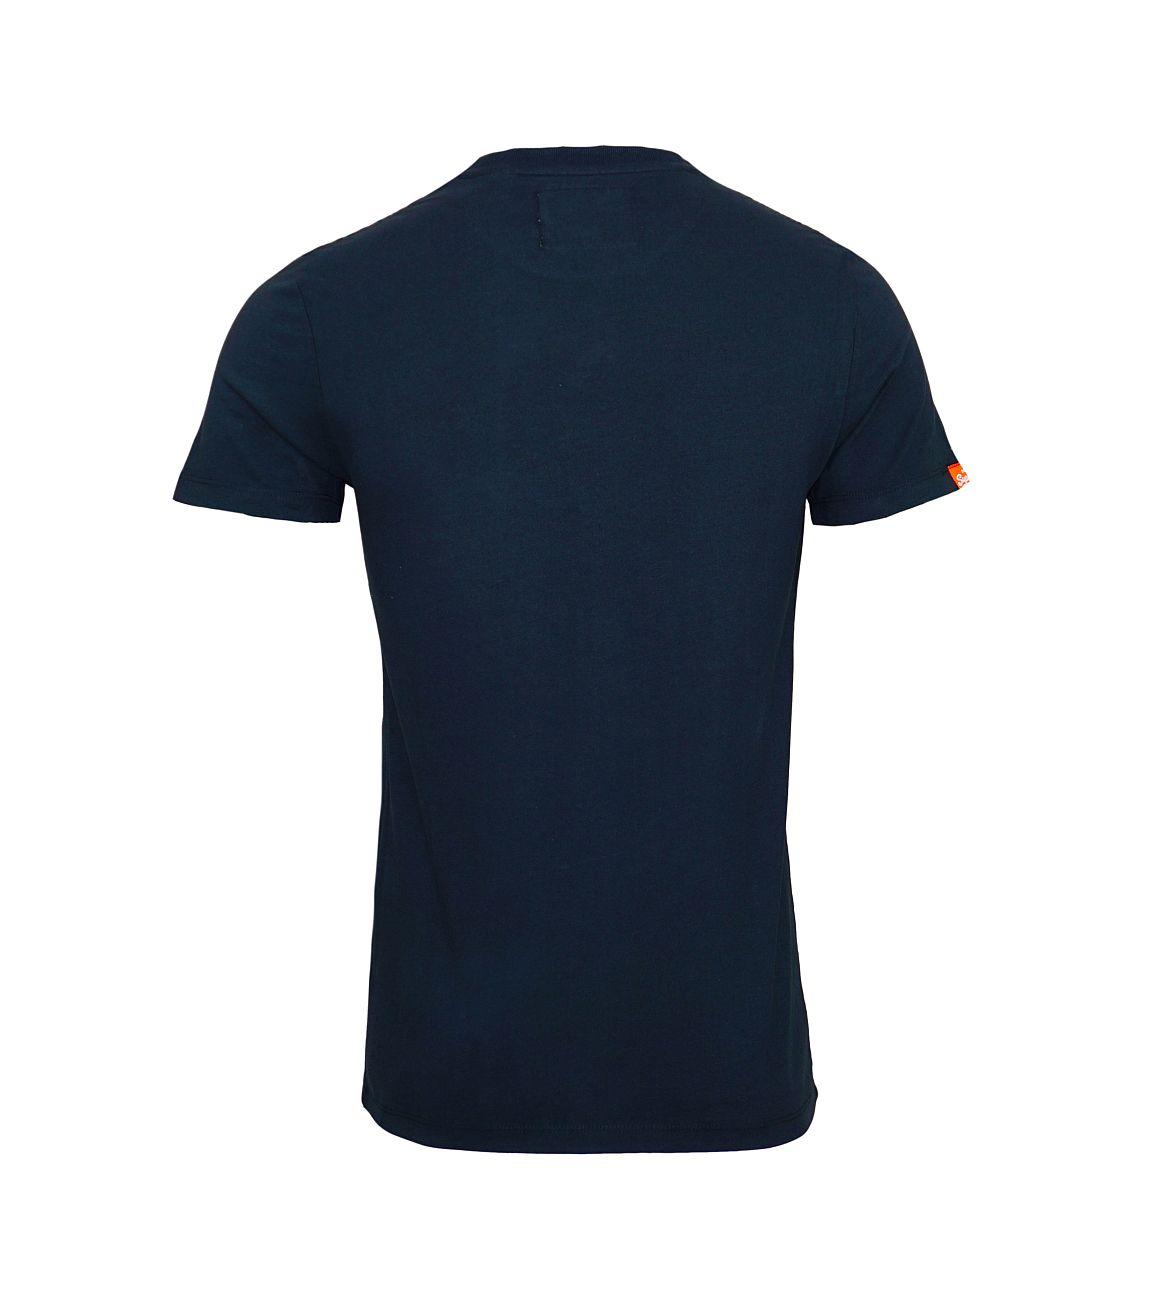 Superdry T-Shirt Orange Label Vintage EMB Tee M10000NS1 Eclipse Navy F18-SDT1